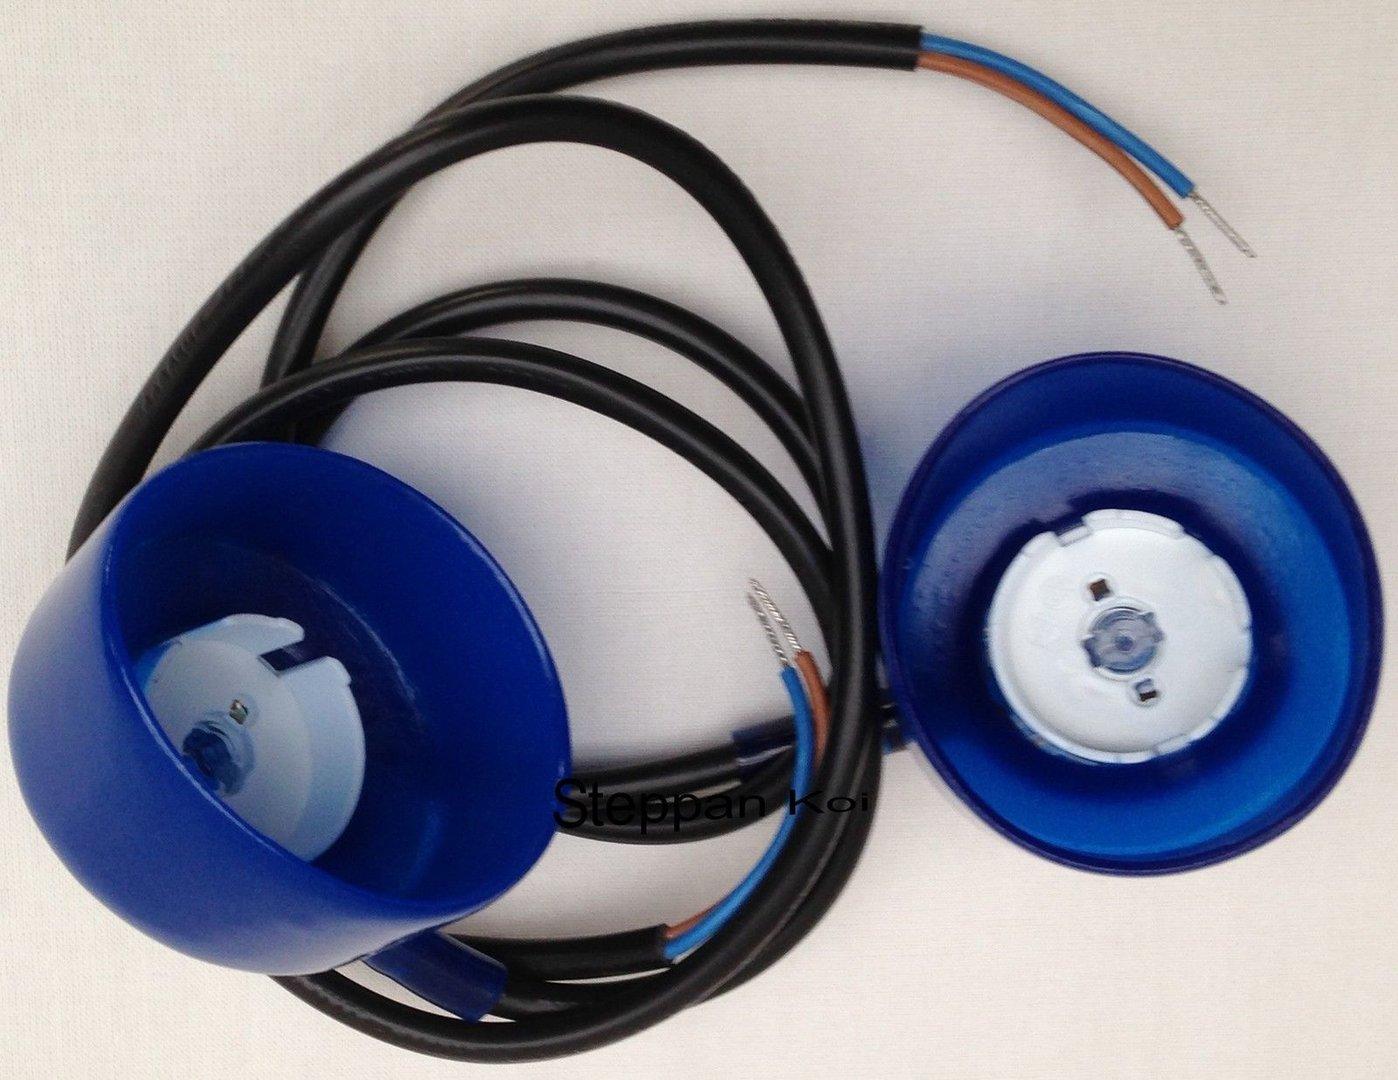 55 Watt 2 x Ersatz-Kabel mit Lampenfassung f TMC Pro Clear UVC Gerät 30 u